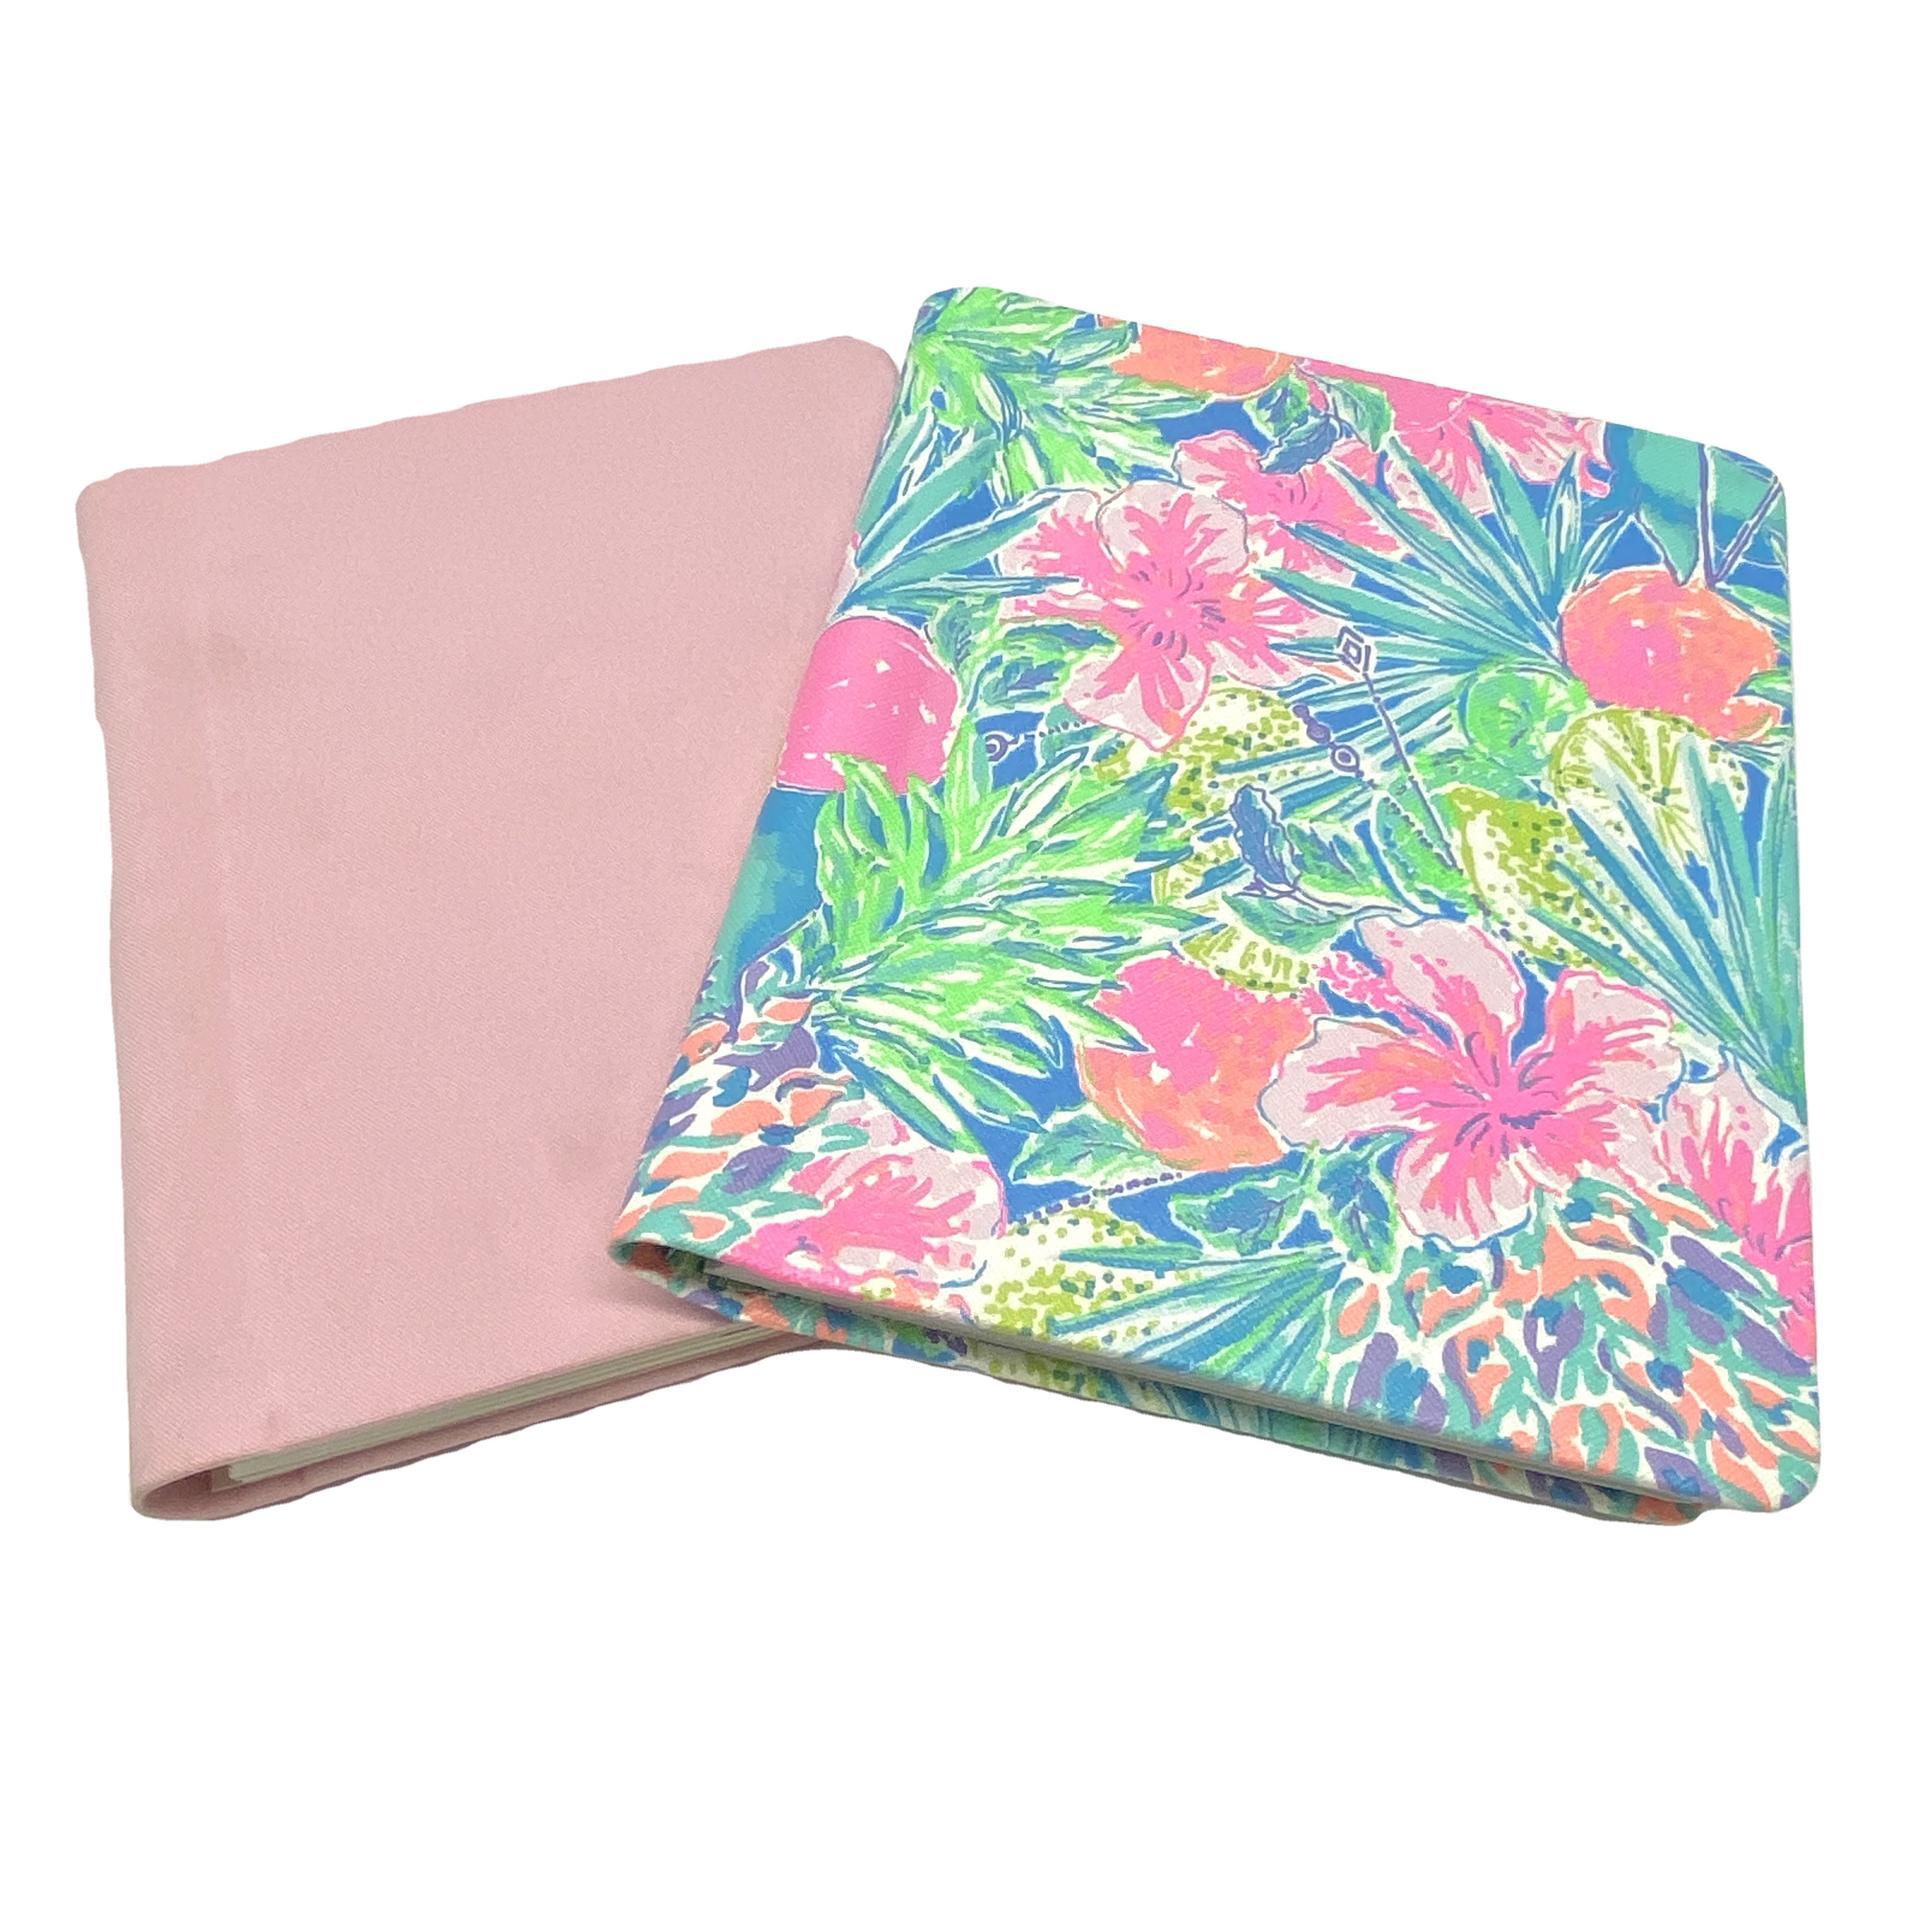 product-Elegant A5 Pink Linen Customized Binder Hardcover Spiral Planner-Dezheng-img-1